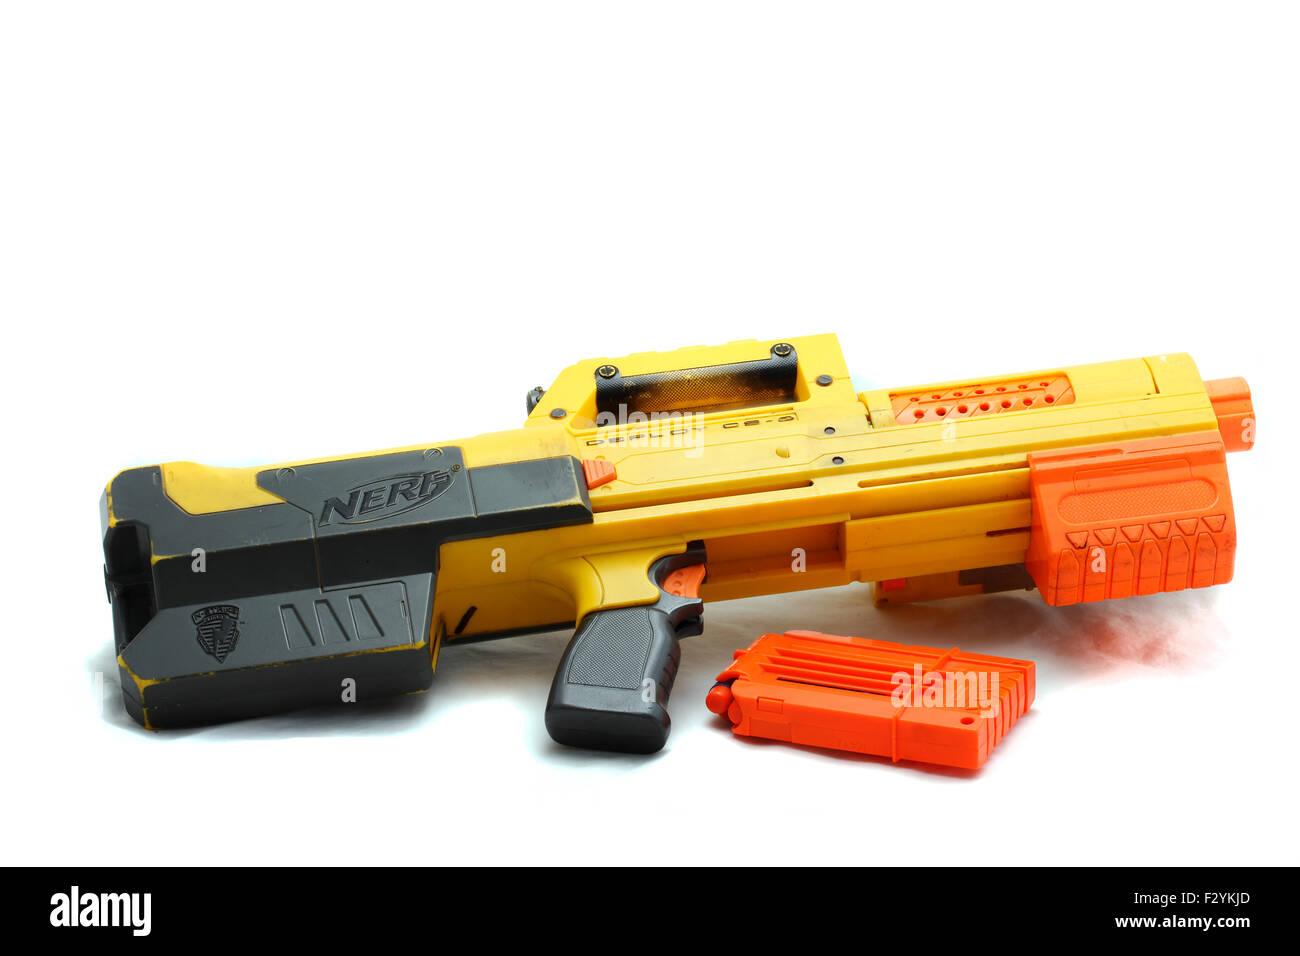 Nerf Gun Stock Photos & Nerf Gun Stock Images - Alamy